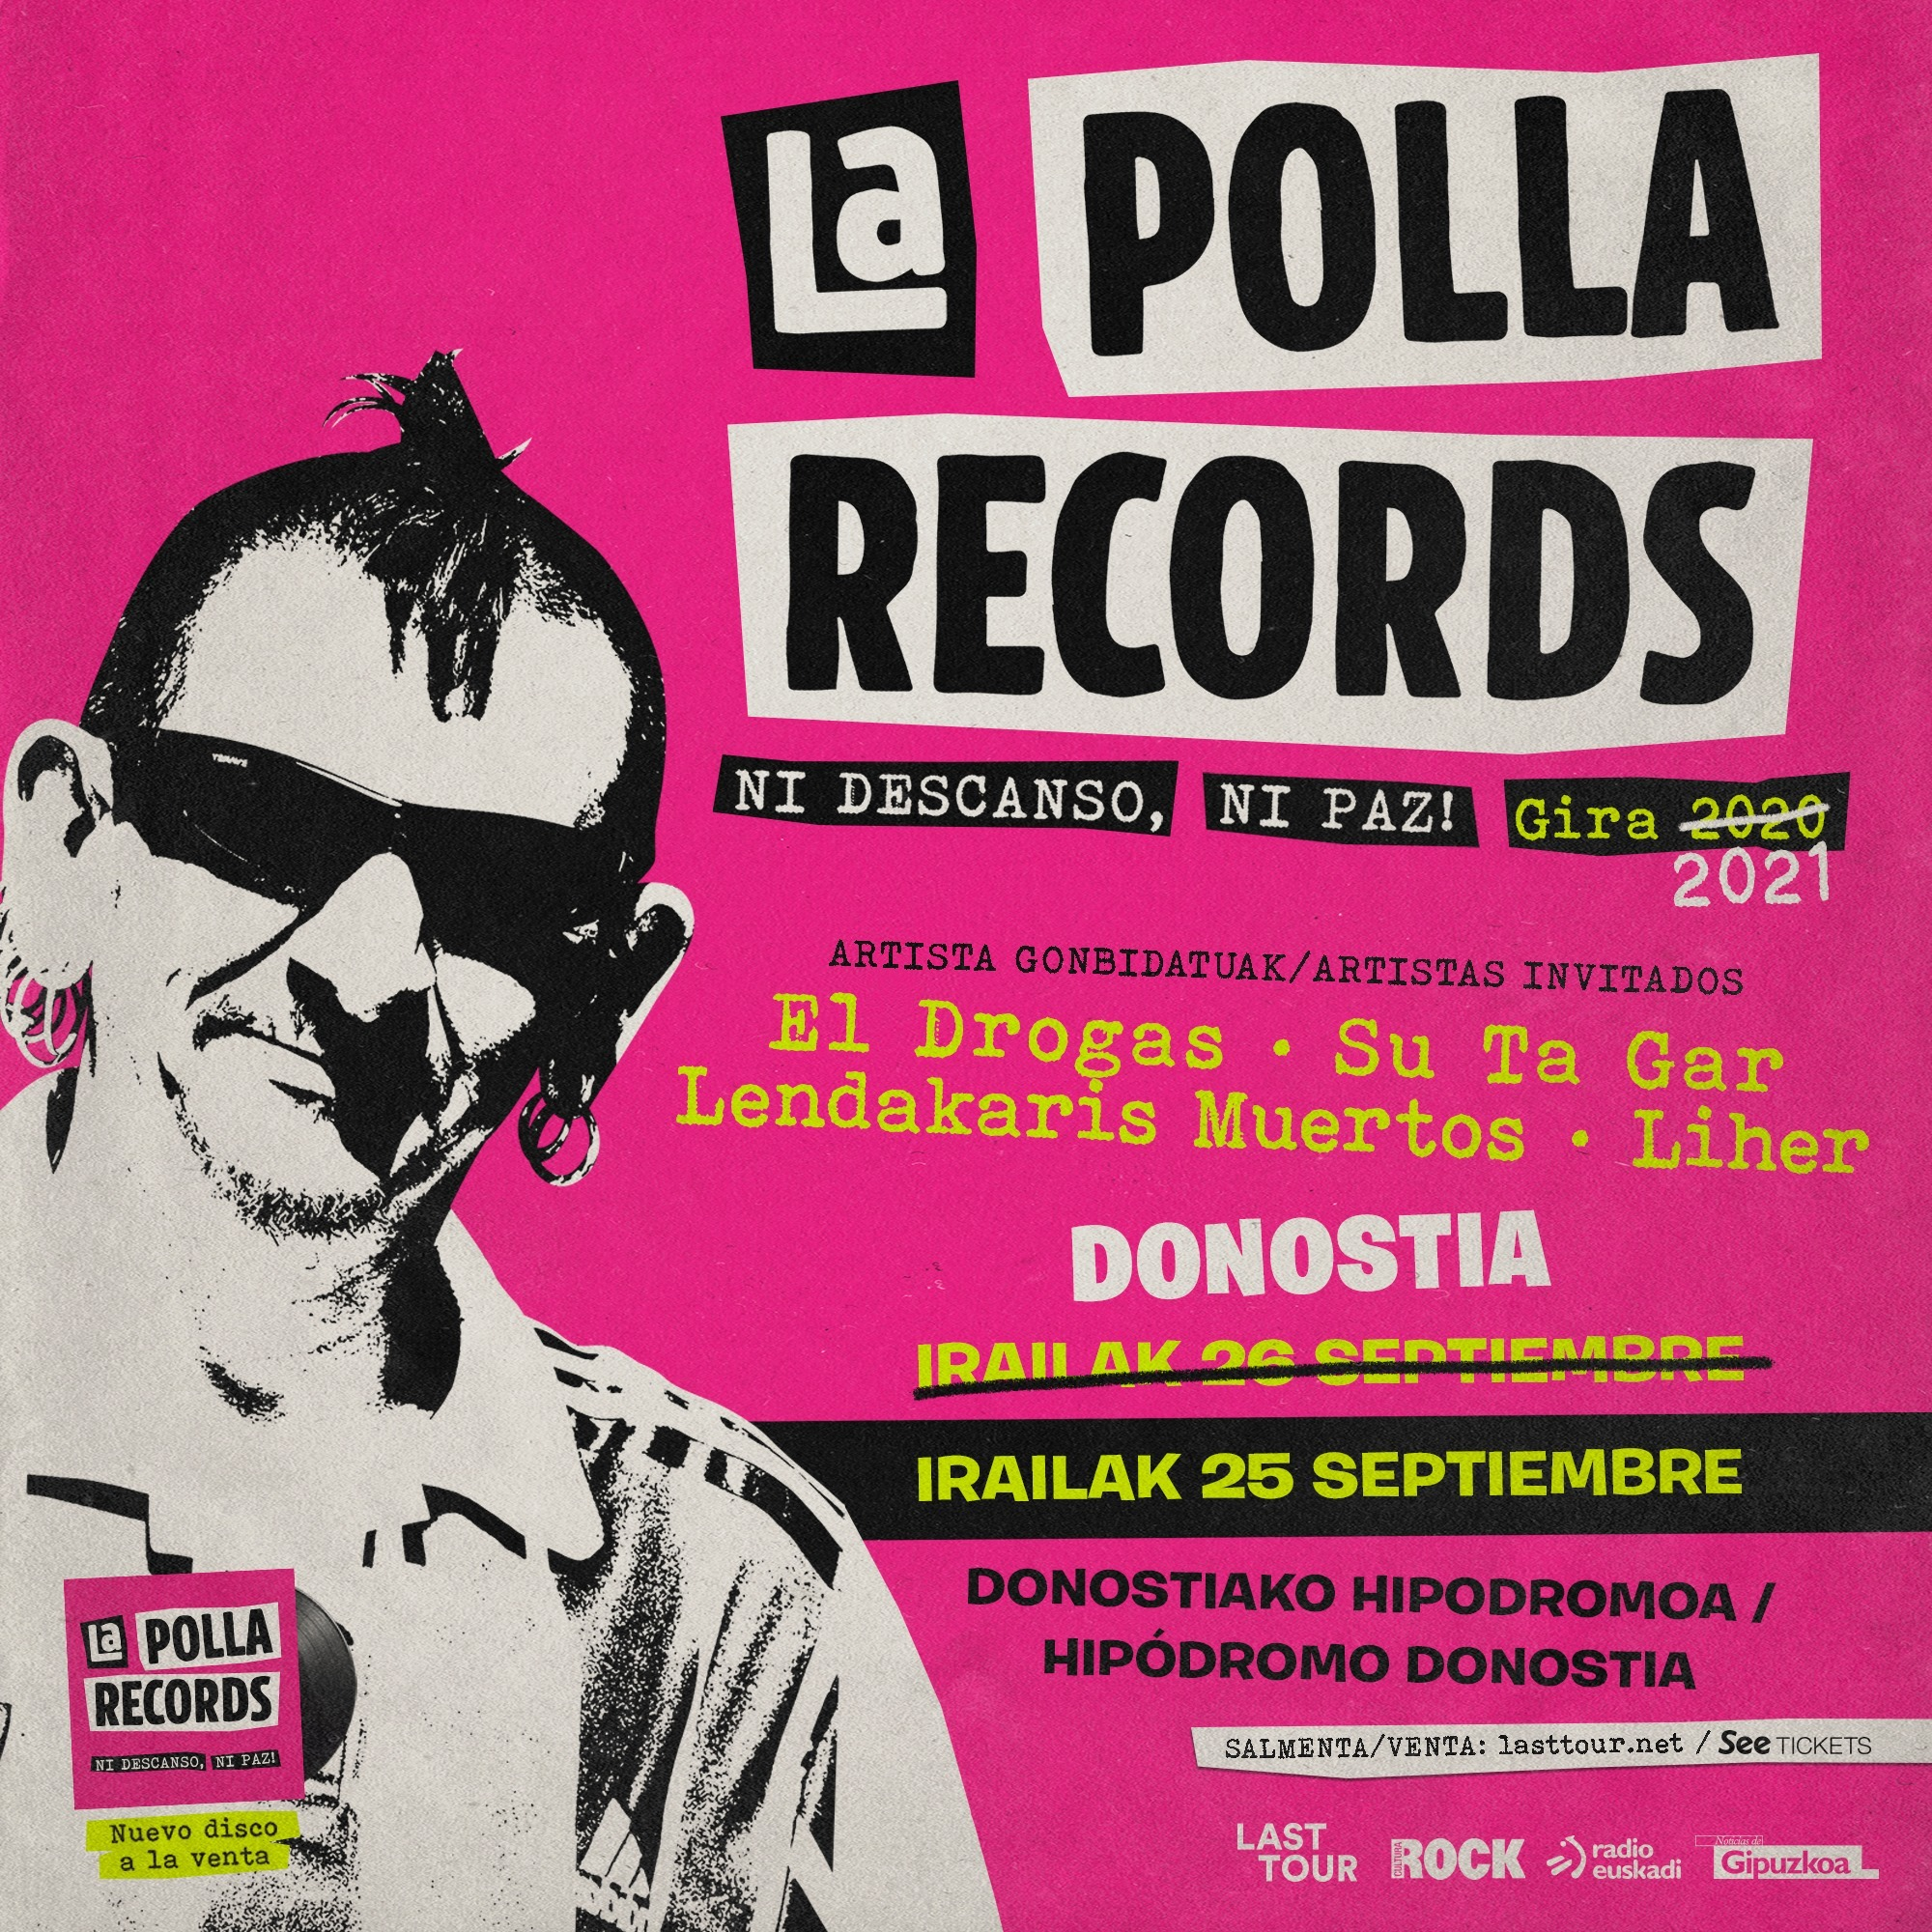 La Polla Records + El Drogas + Su Ta Gar + Lendakaris Muertos + Liher